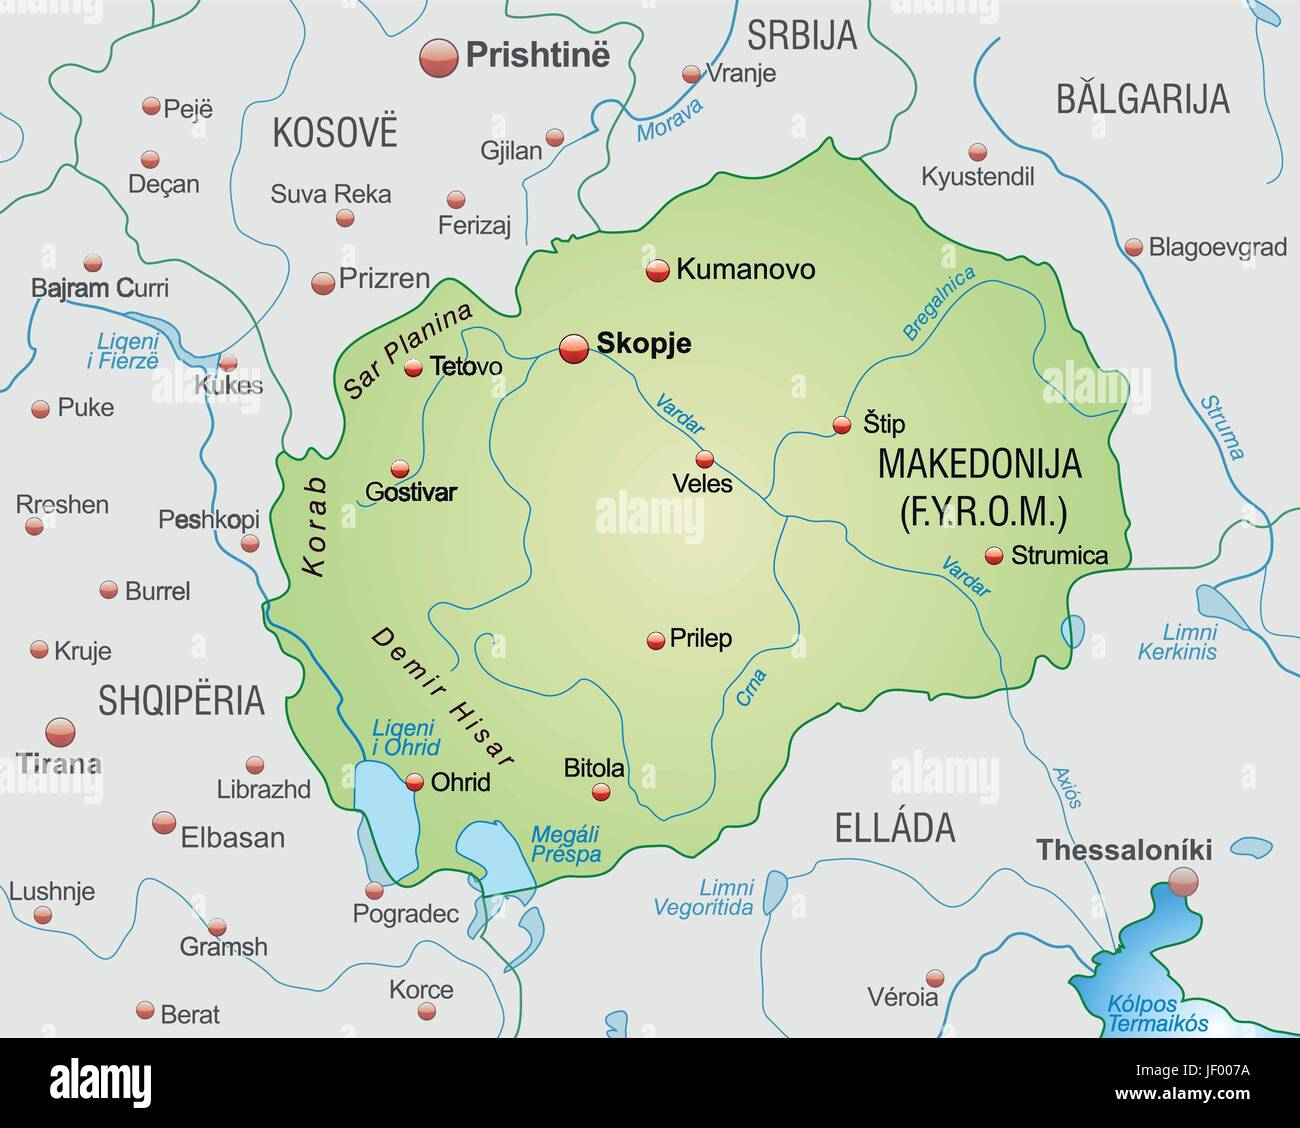 Border Card Synopsis Borders Macedonia Atlas Map Of The World